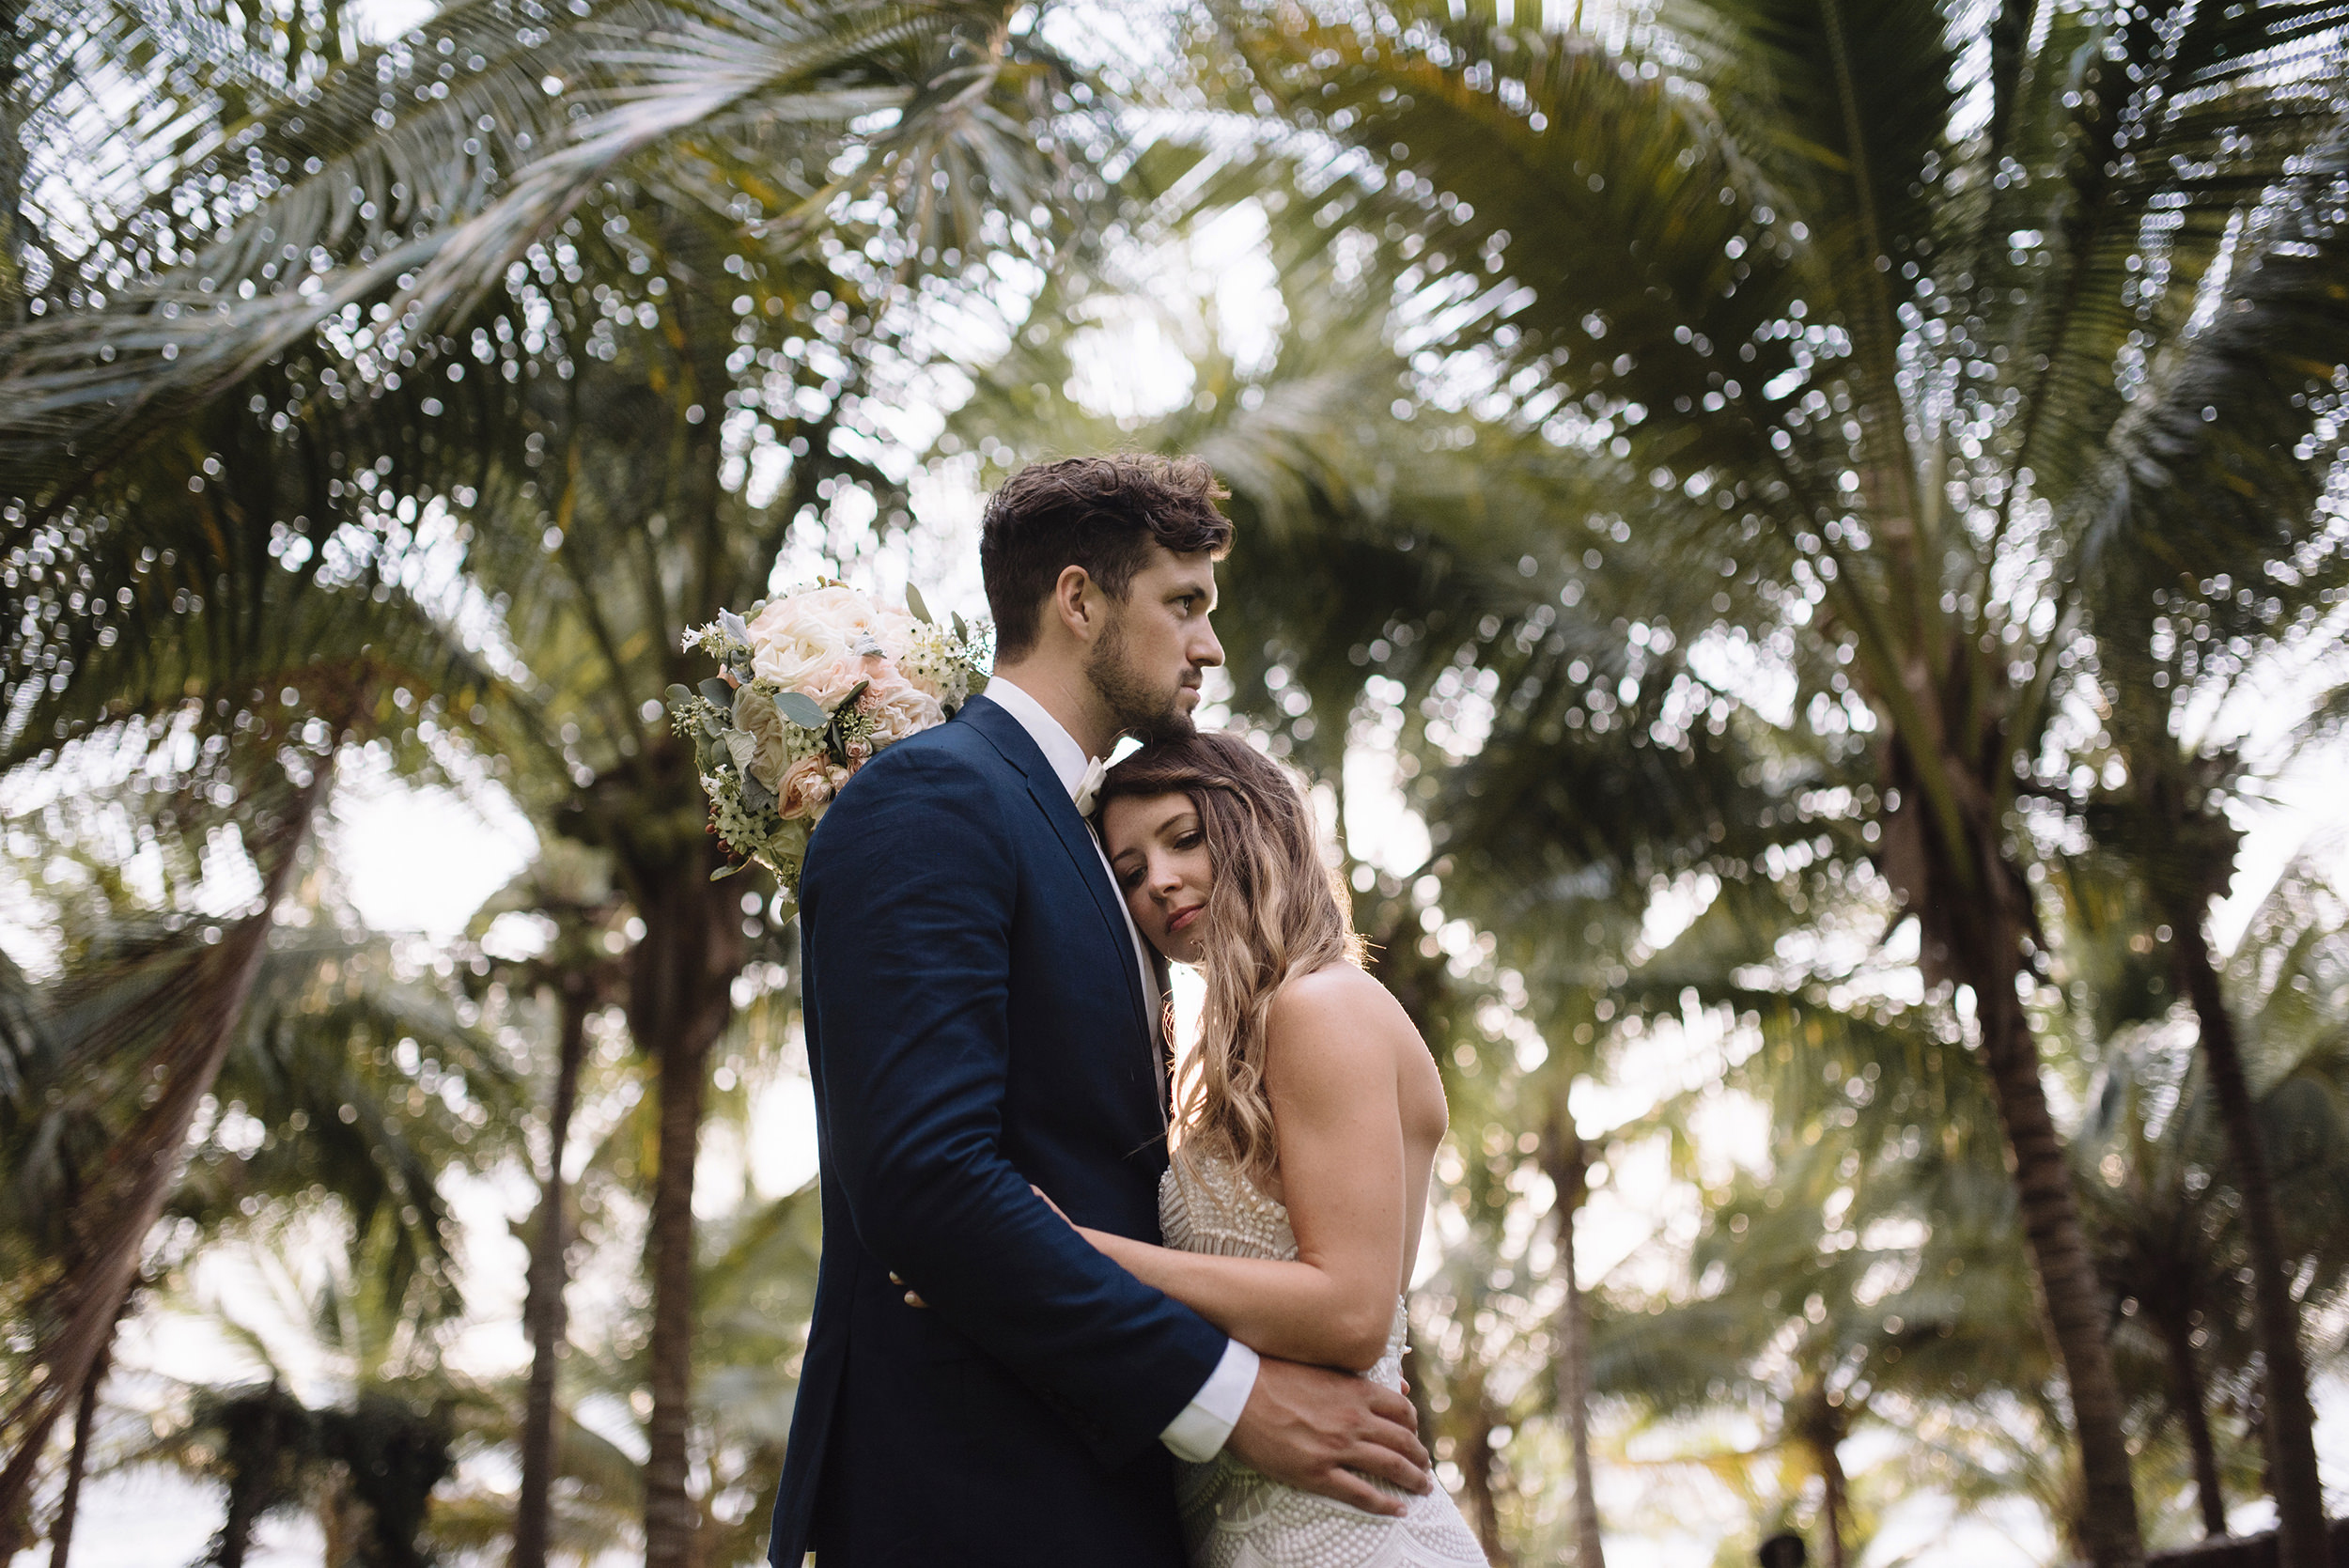 Colby-and-Jess-Intimate-Destination-Wedding-Sayulita-Puerto-Vallarta-Mexico114.jpg